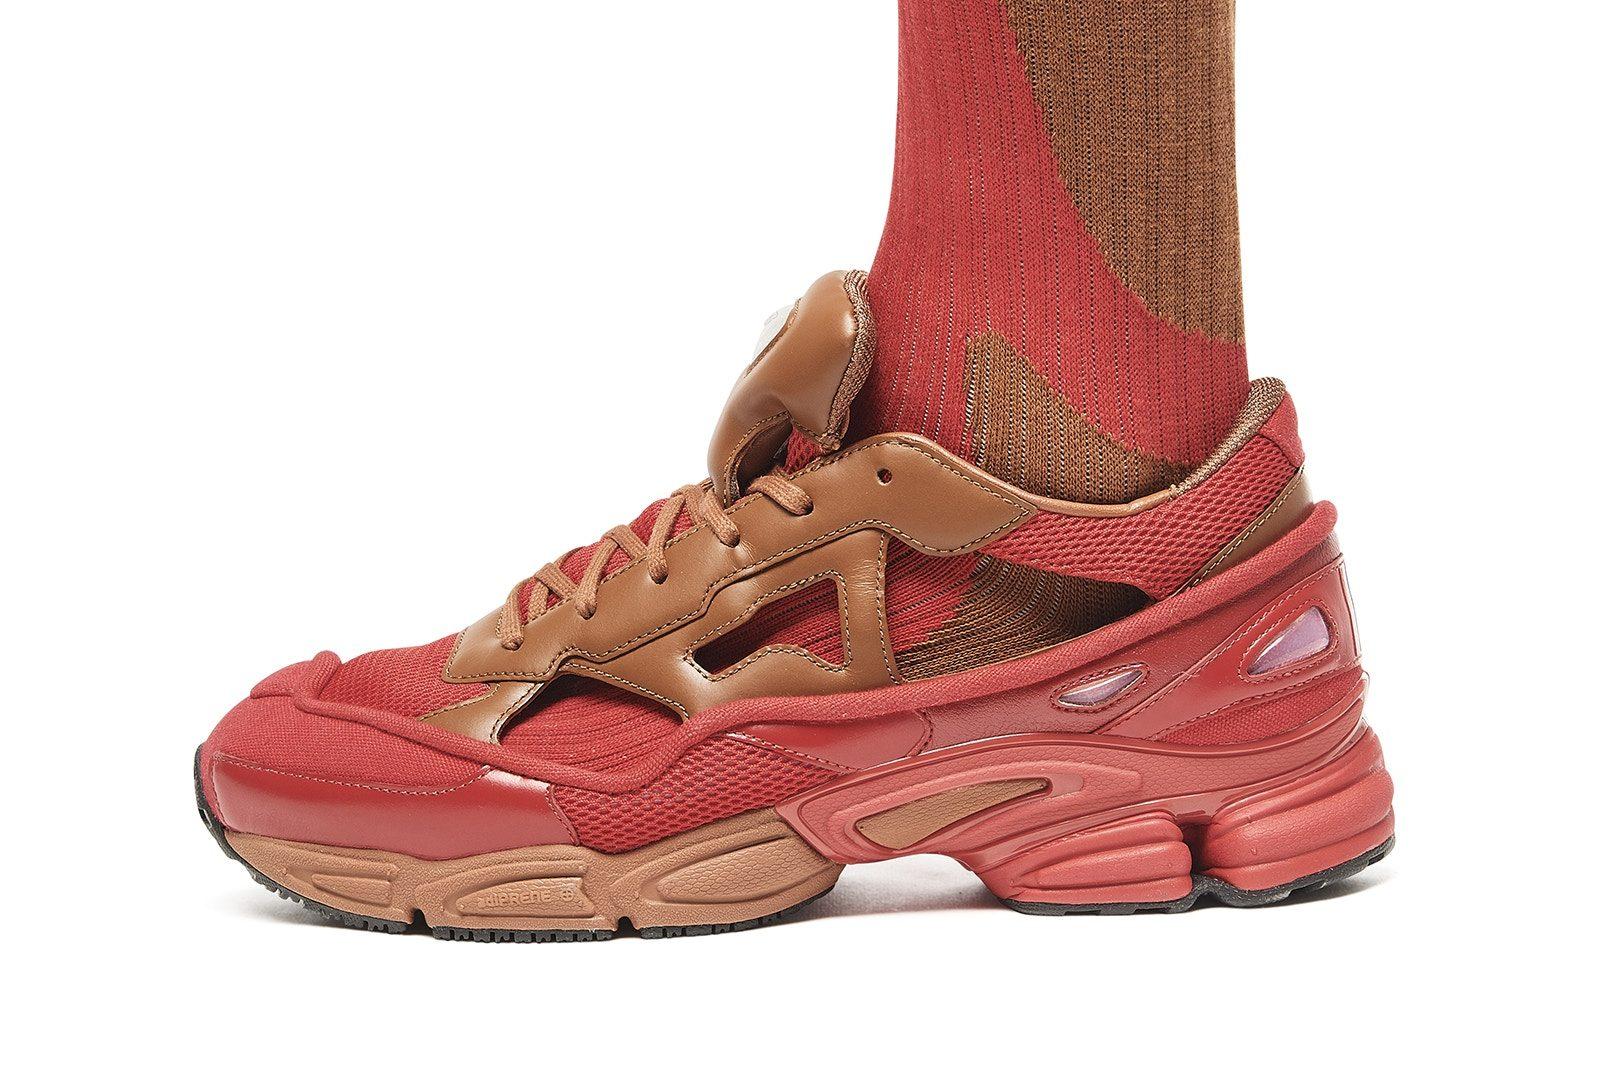 Raf Simons x adidas Ozweego 1 sneakerbox.hu blog